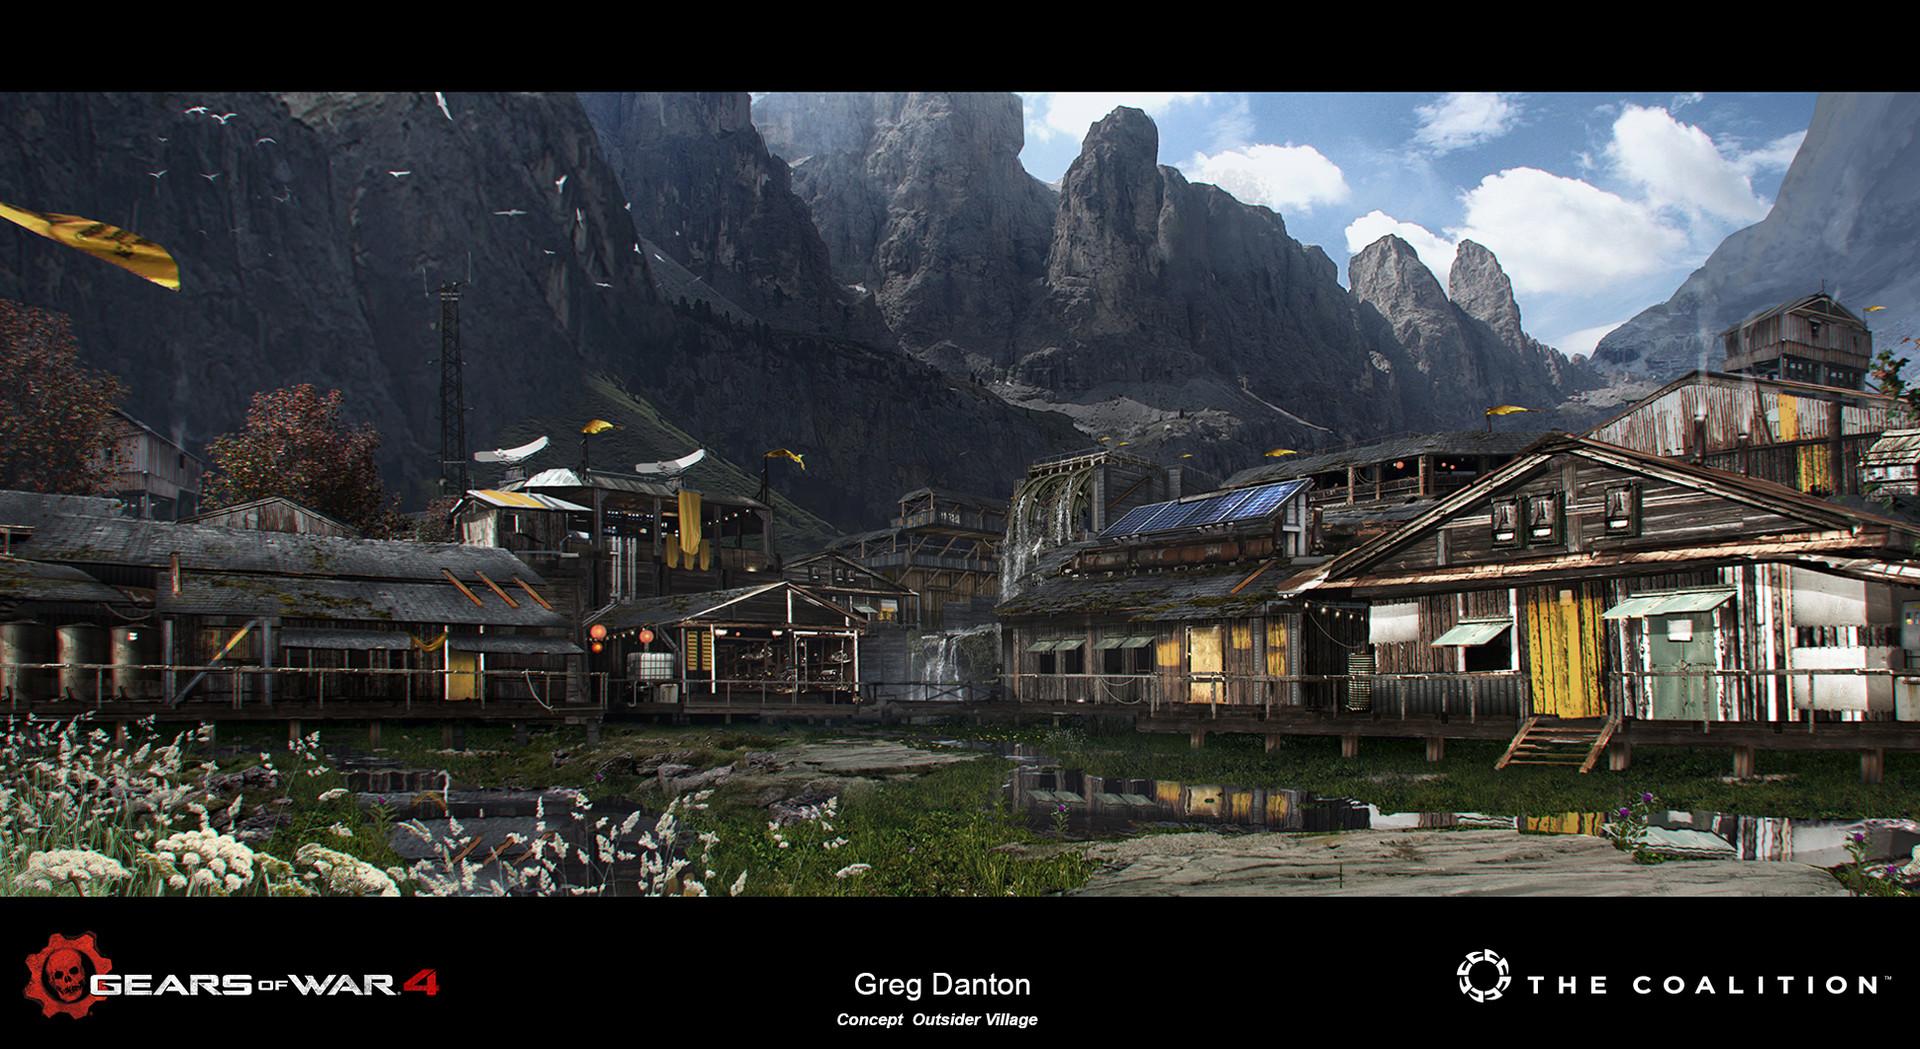 Greg danton art 24